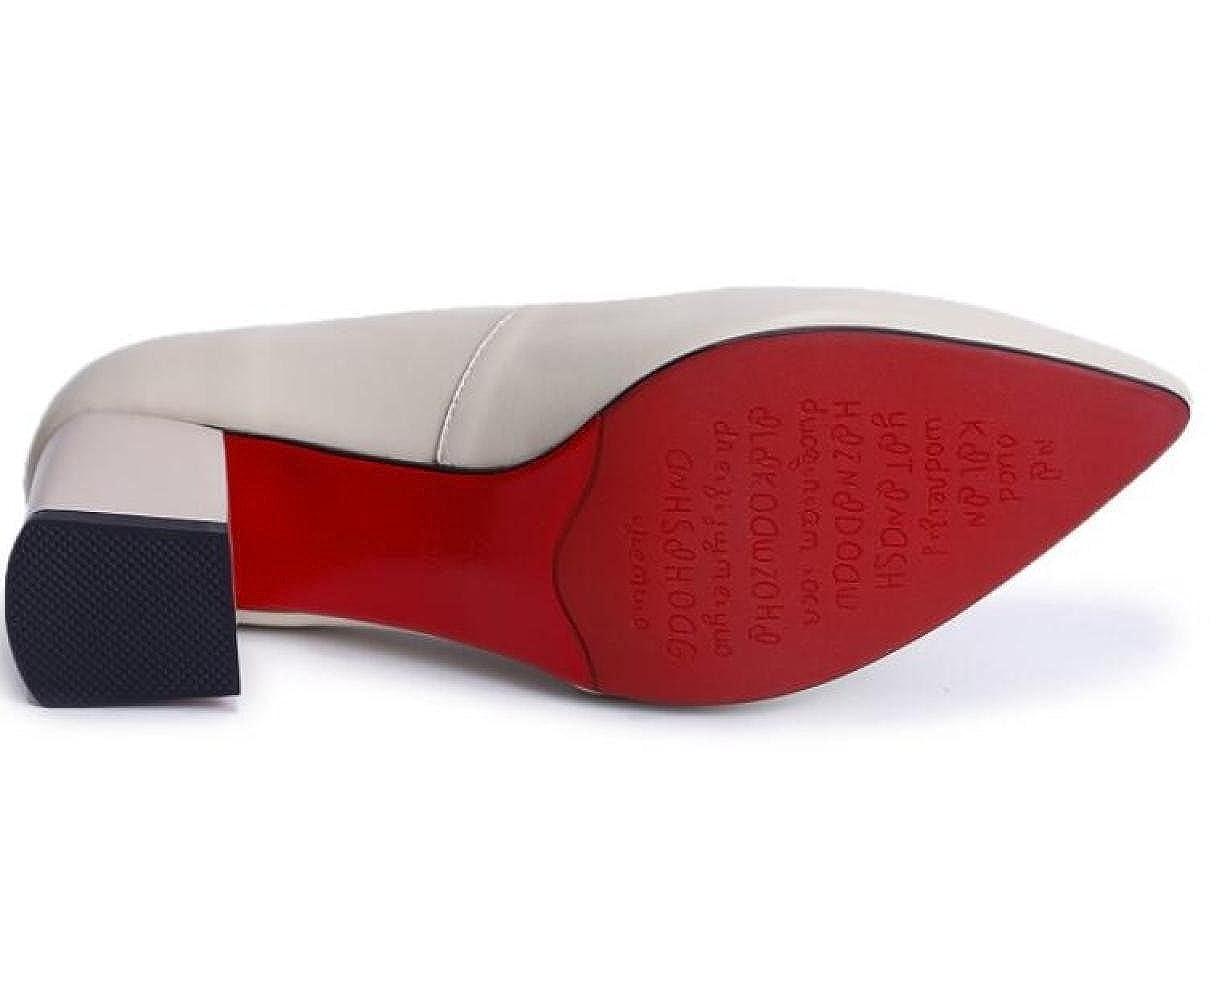 KNGMGK KNGMGK KNGMGK Lederschuhe Herbst Einzelne Schuhe Europäische und Amerikanische Mode Niedrige Schuhe B07CMPQGPW Sport- & Outdoorschuhe Moderne Technologie ba8ce1